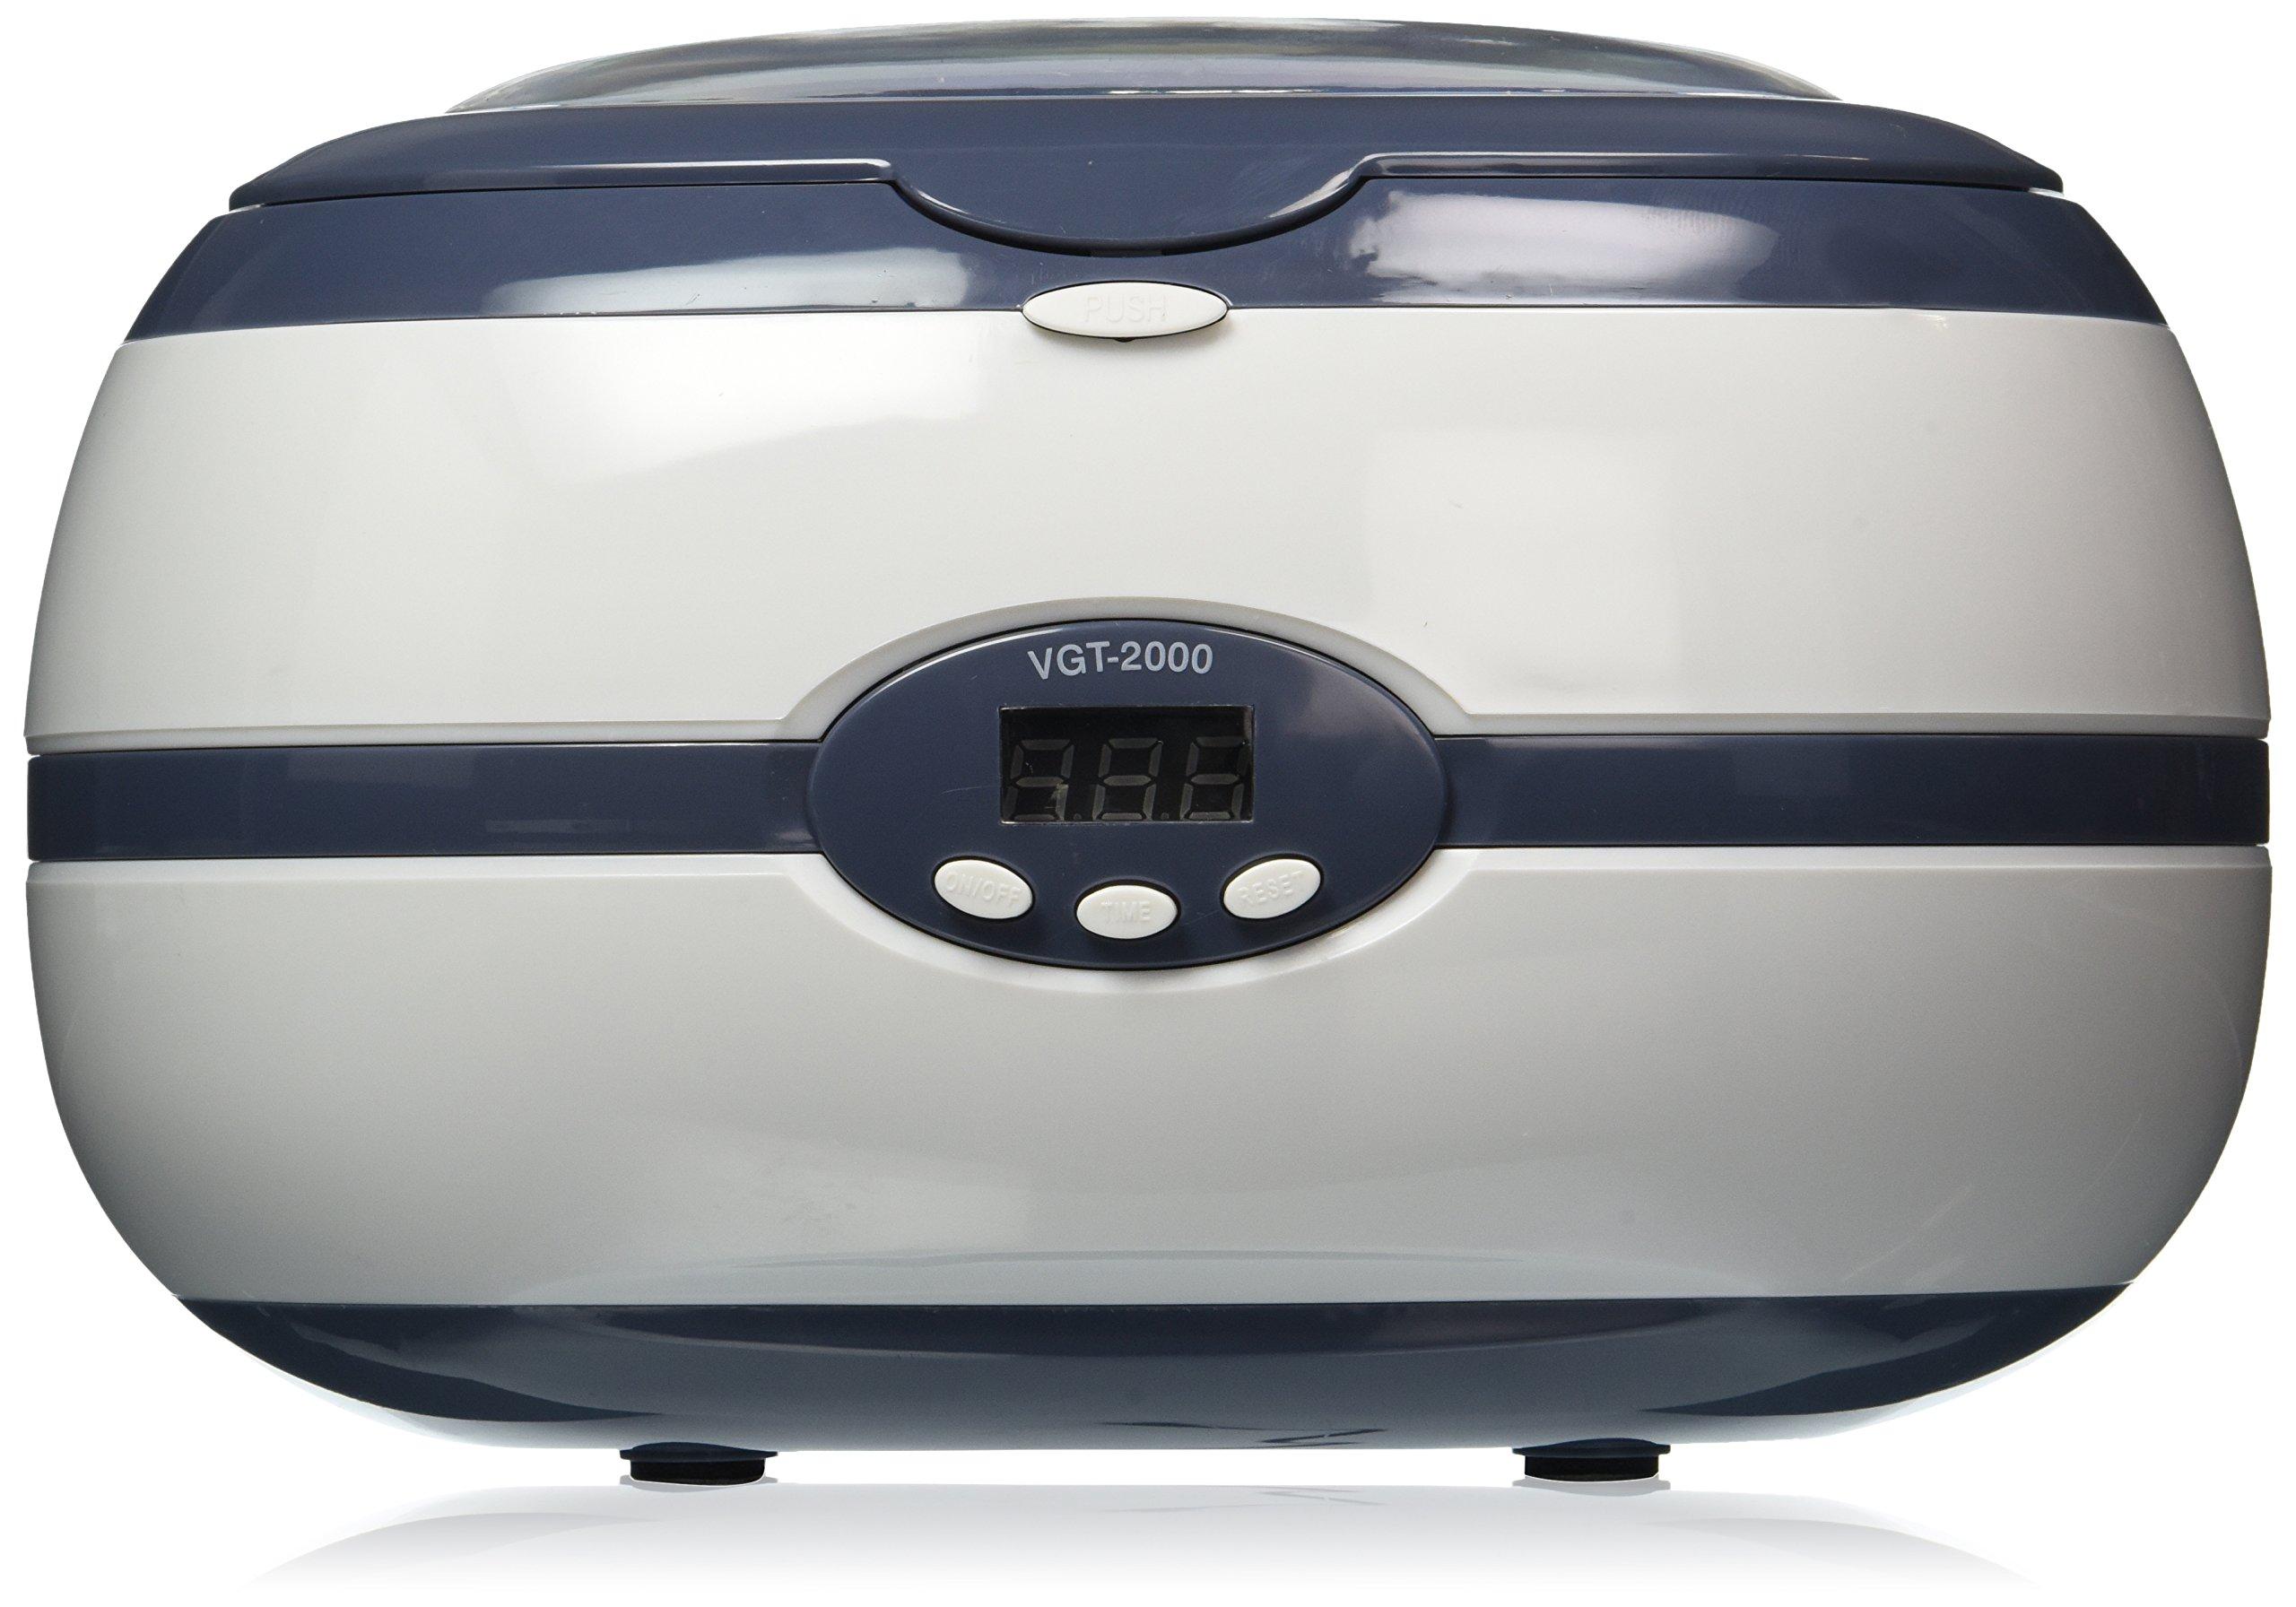 NEW Digital Ultrasonic Cleaner 0.6 Liters 600ml Capacity / Tattoo Equipment / Tattoo Needles / Tattoo Machines / 2000 by Pirate Face Tattoo